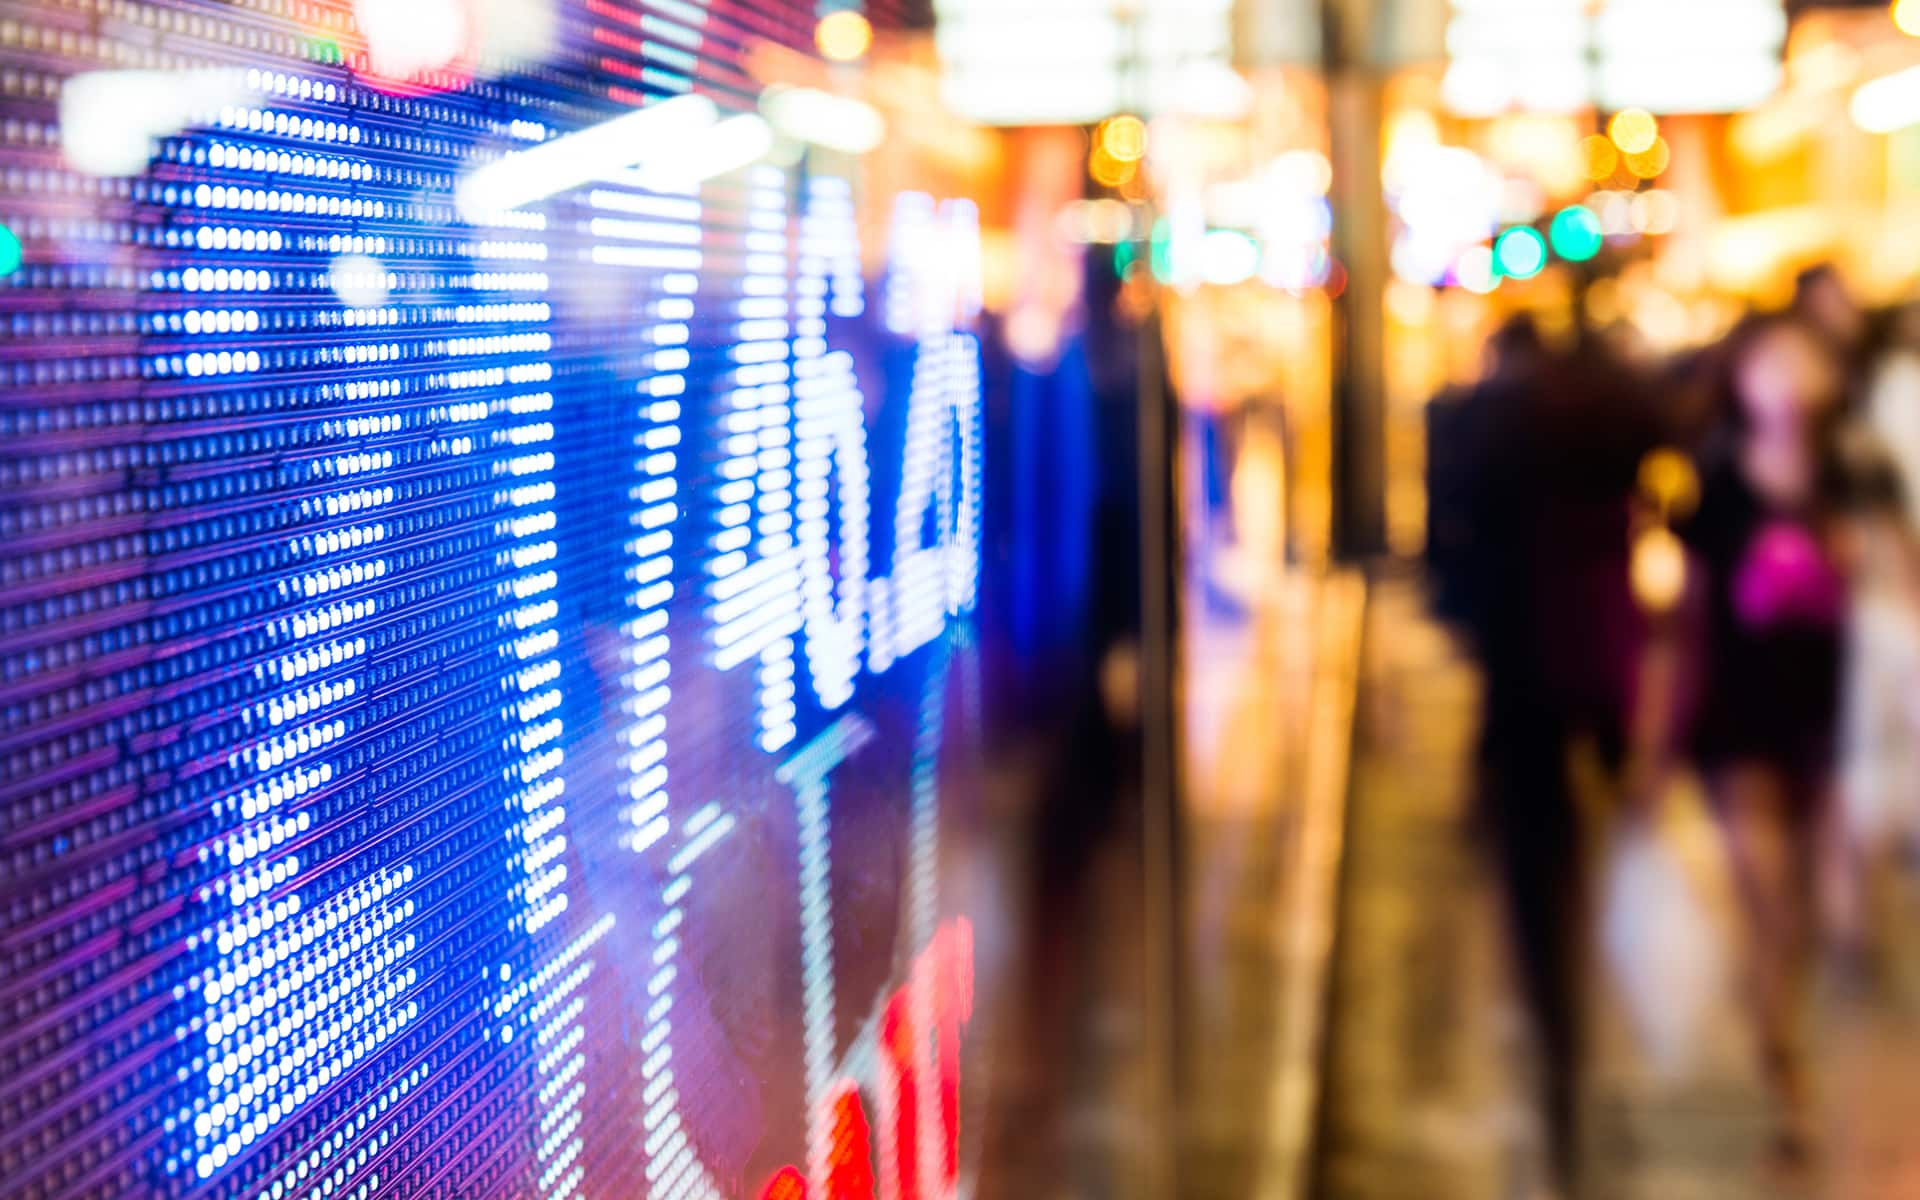 process thinking insurance: digital display